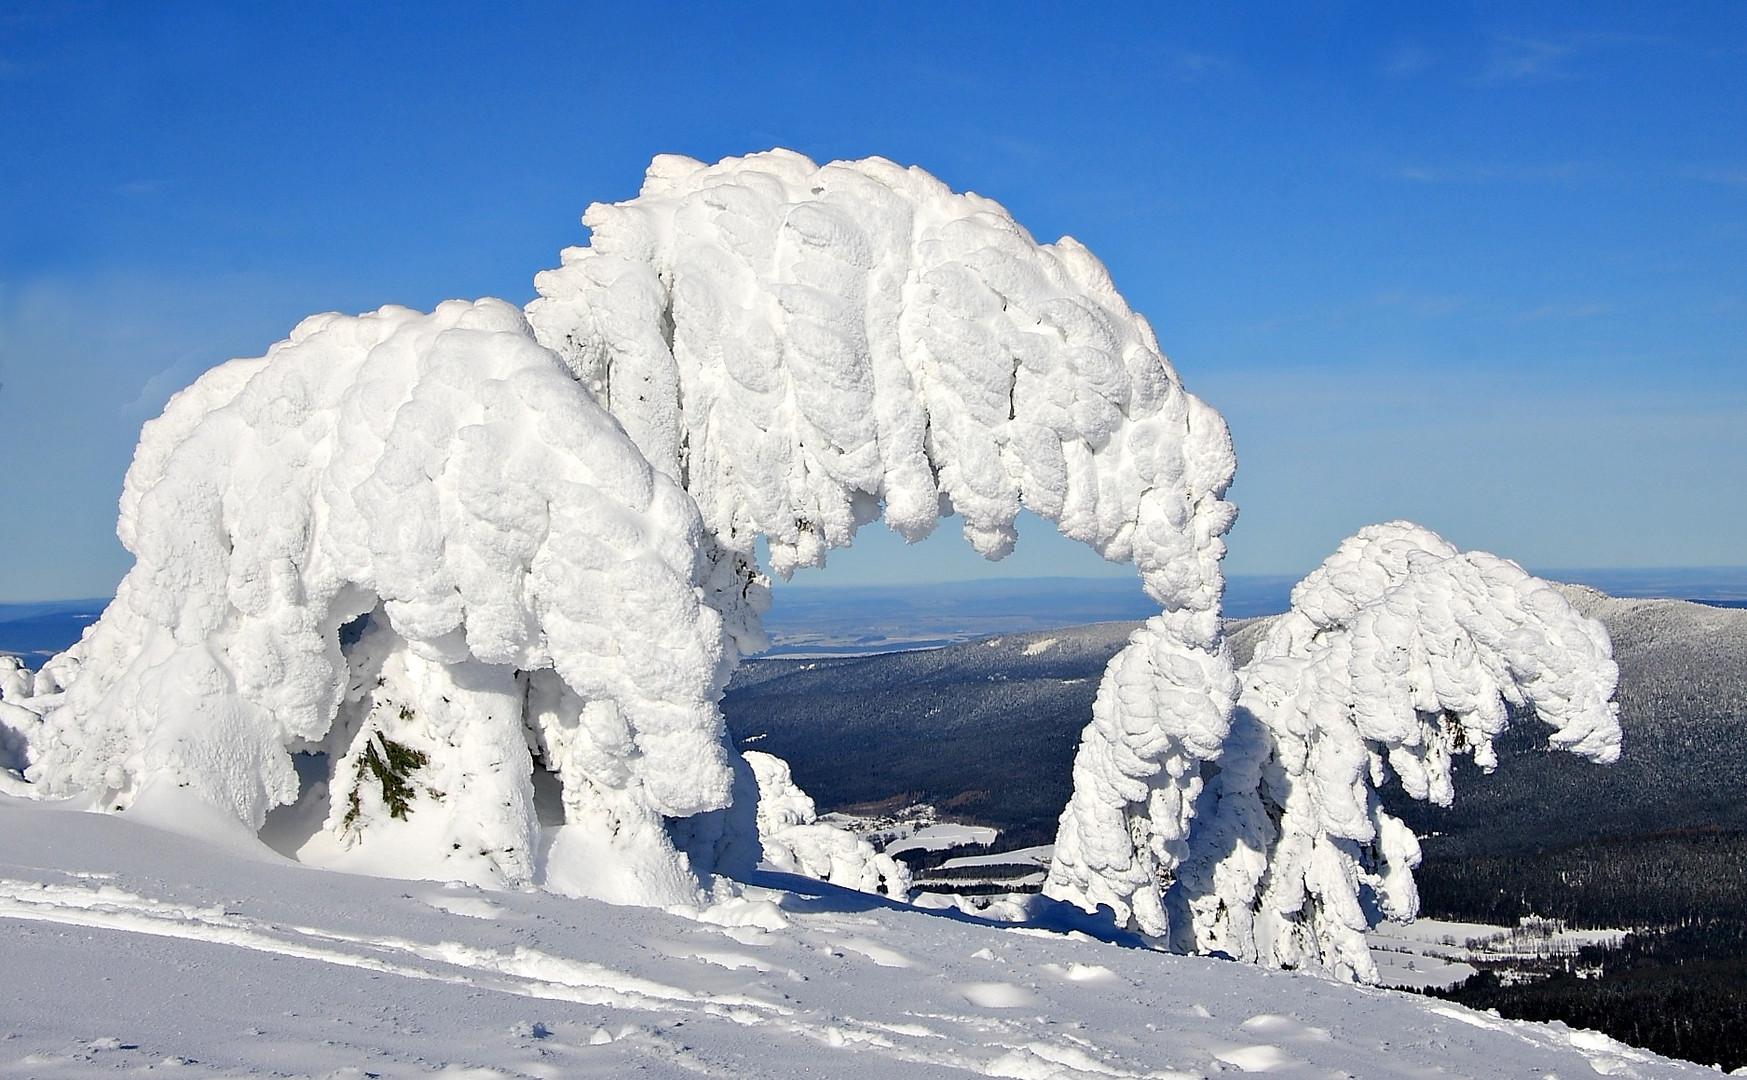 Winterkunstwerke